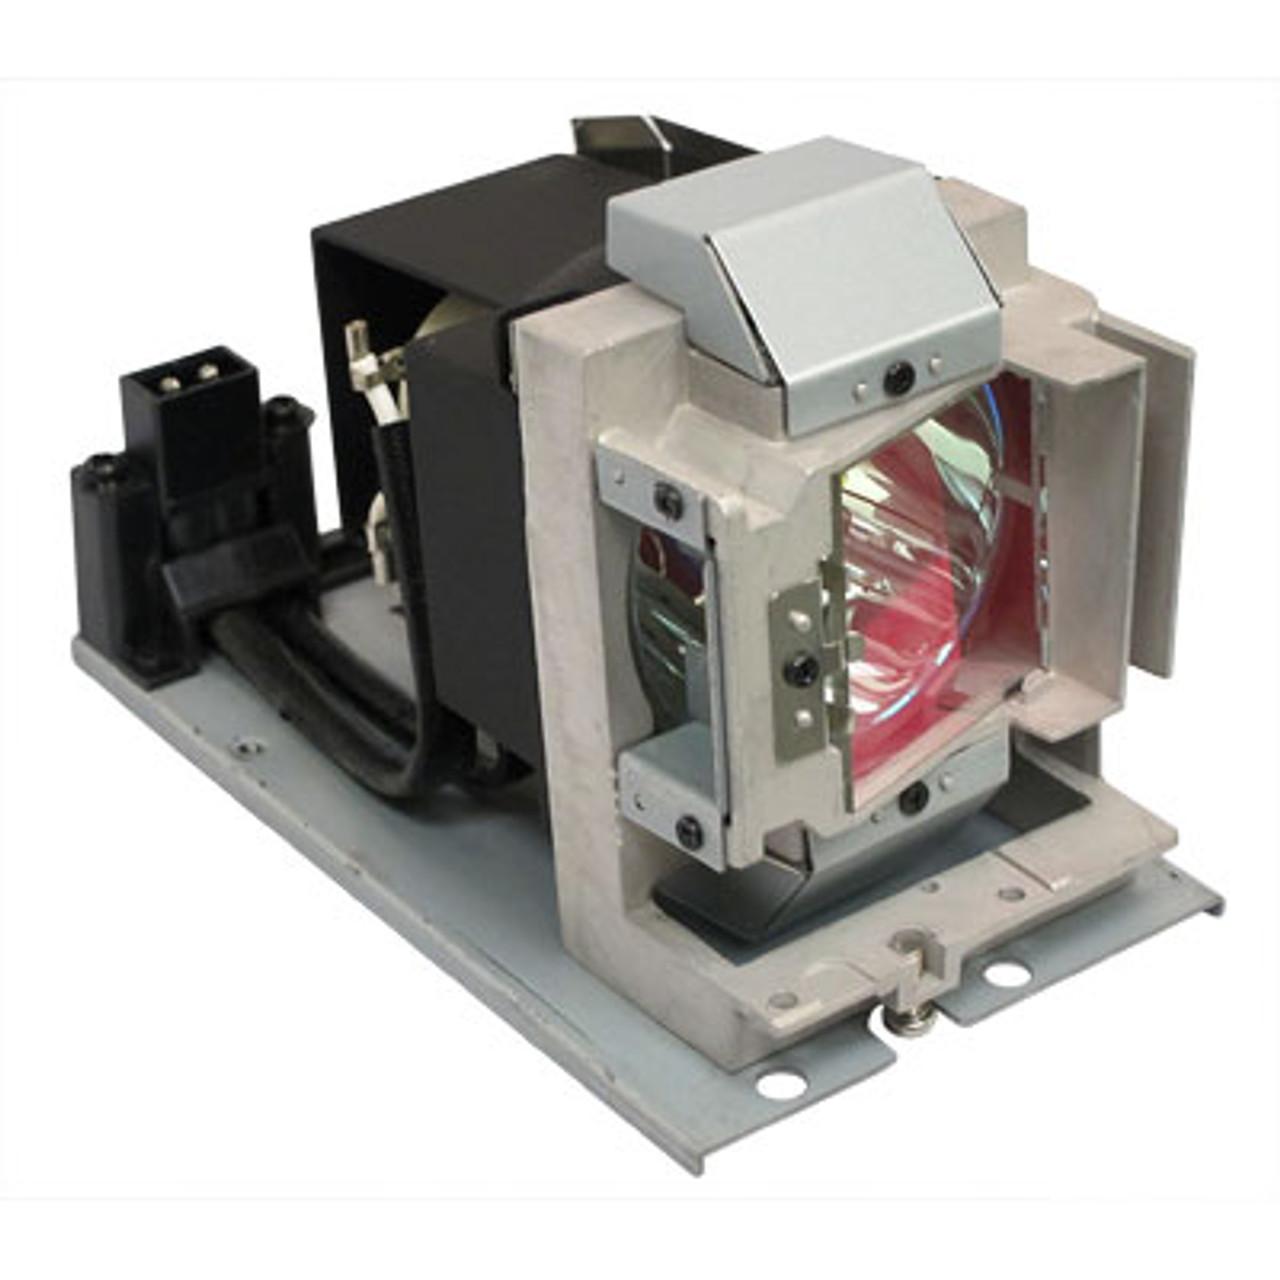 InFocus SP-LAMP-092 Projector Lamp (SP-LAMP-092)